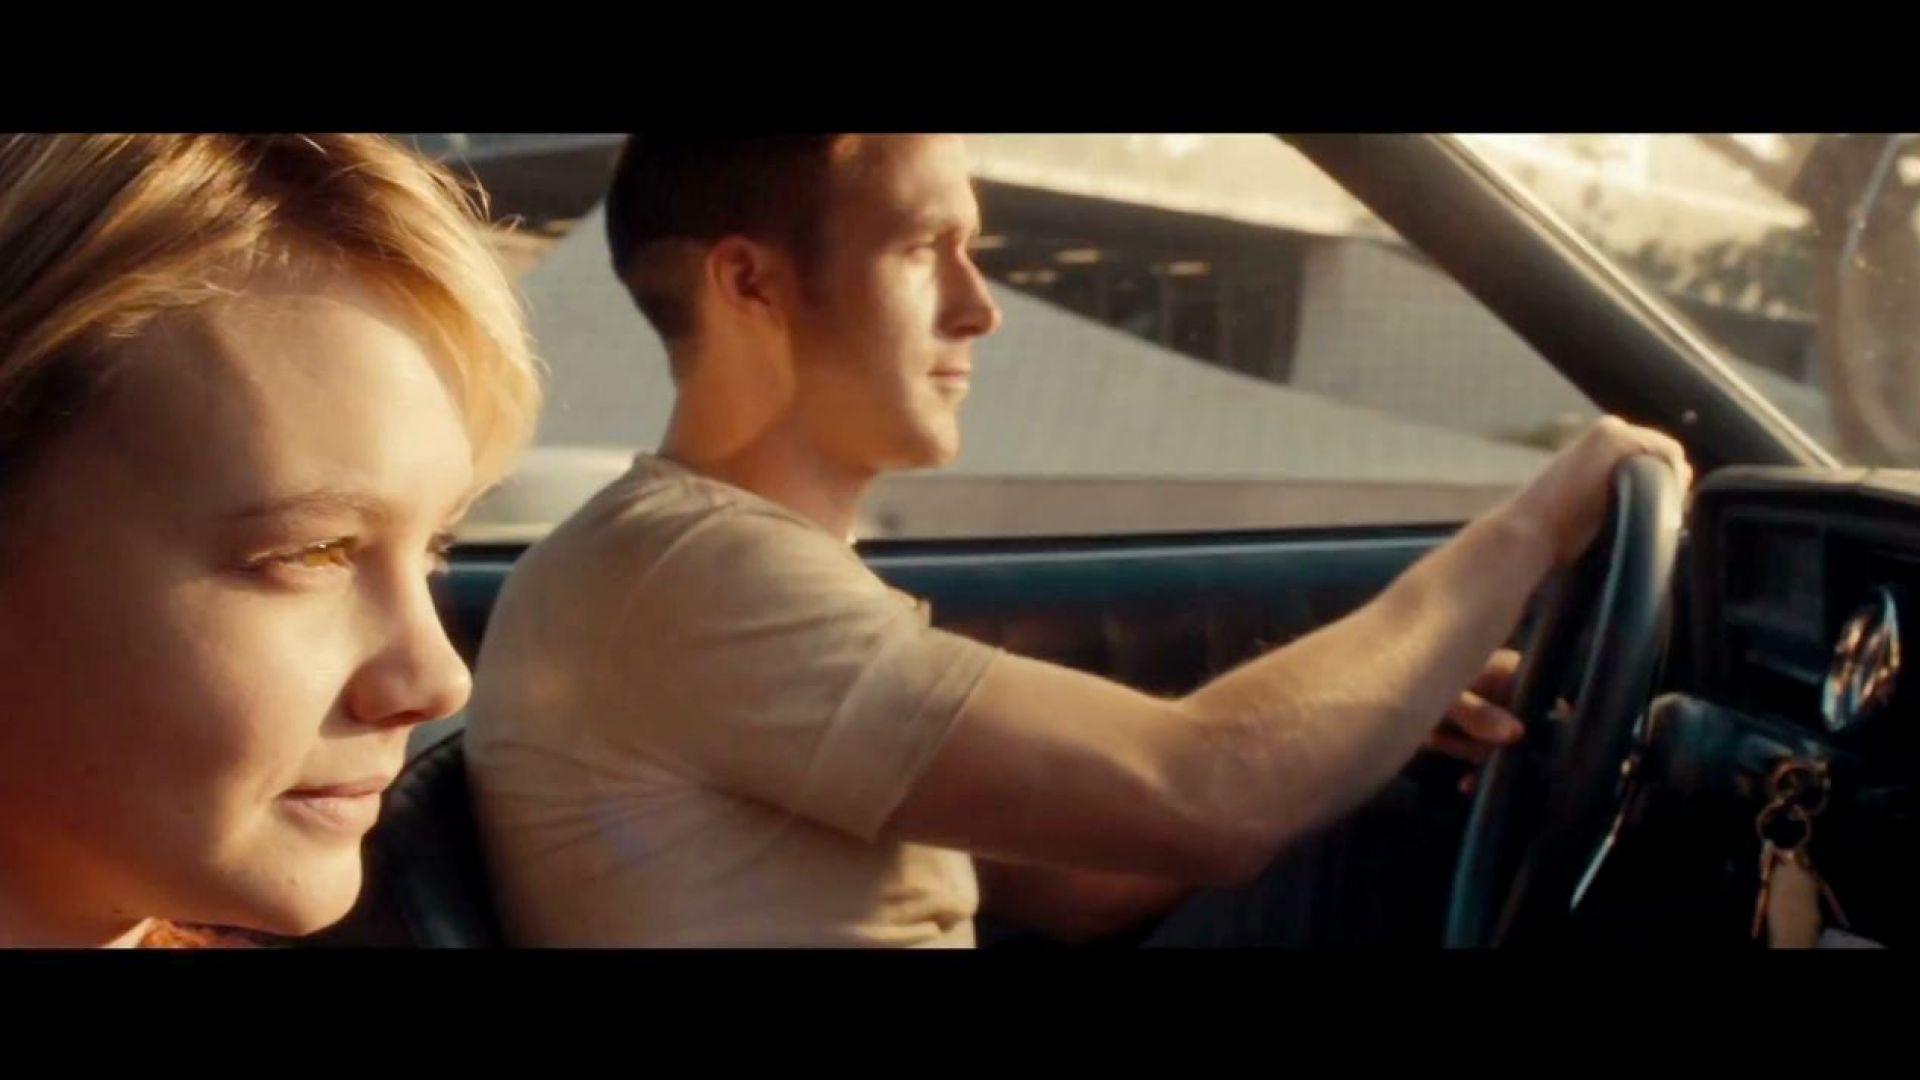 Ryan Gosling drives Irene and Benicio home in Drive